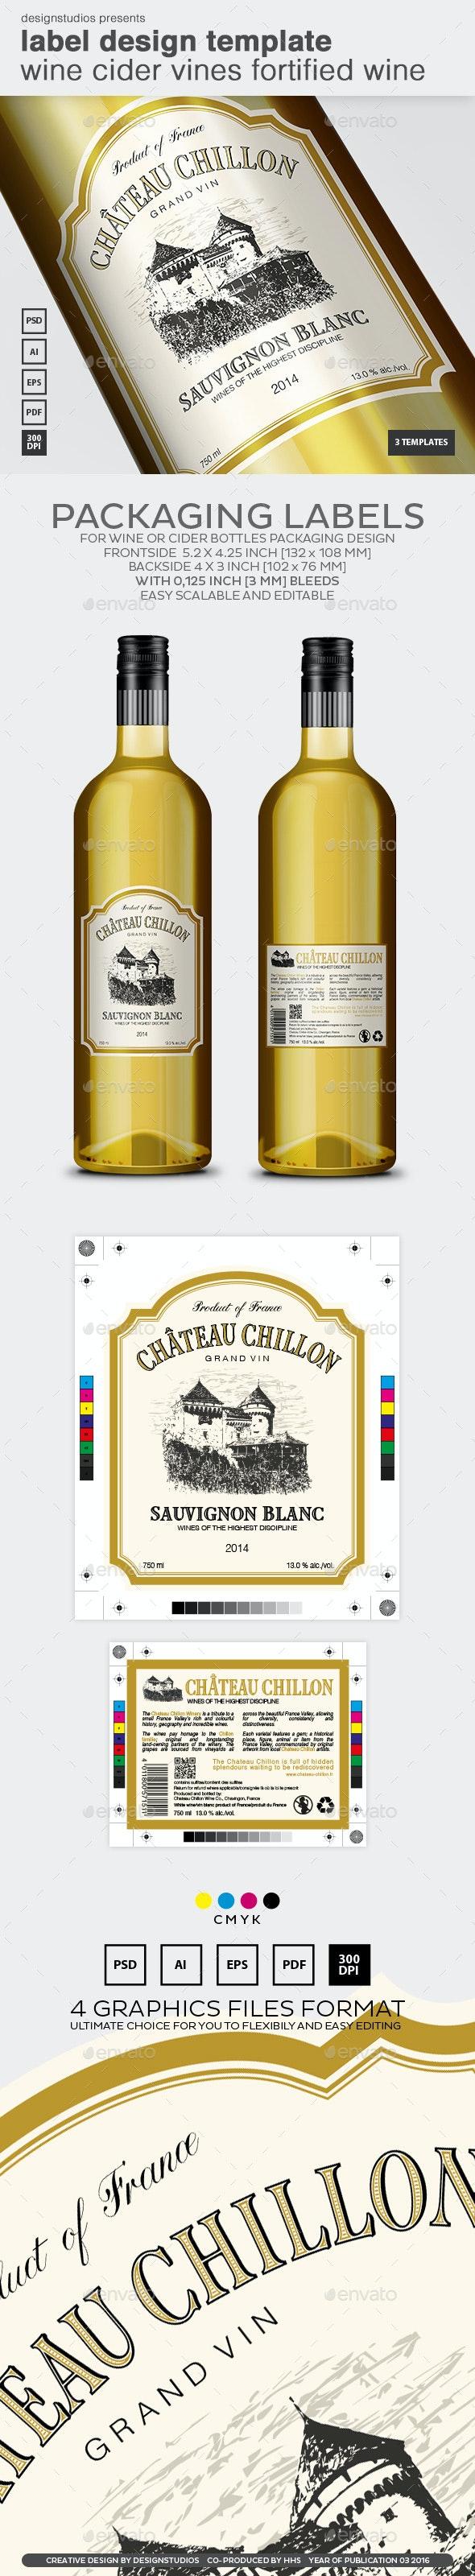 Label Design Template Wine Cider Vines Fortified Wine